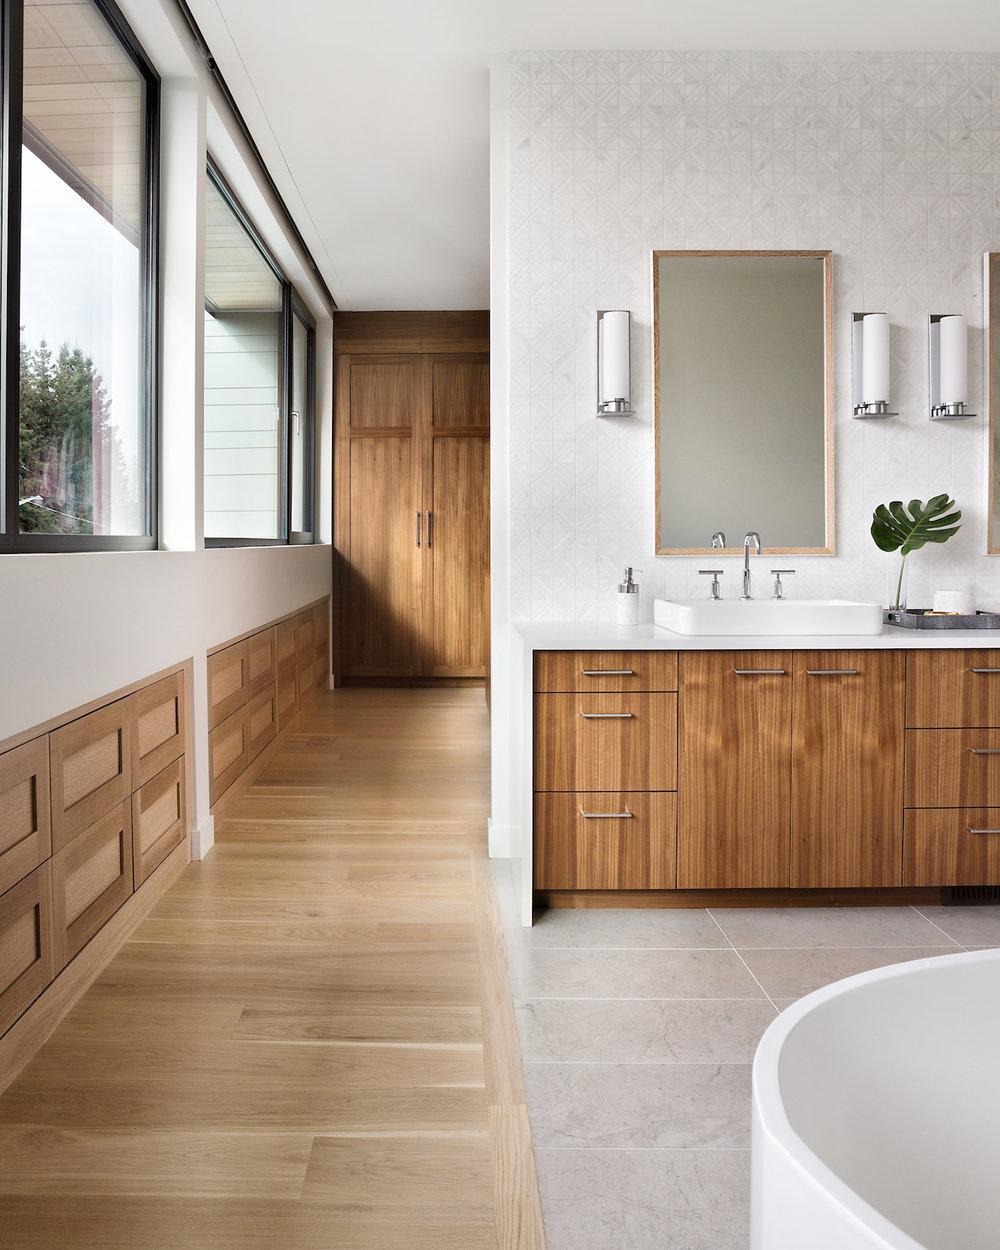 Modern Master Bathroom, Calgary Interior Designer, Nyla Free Designs, DeJong Design Associates, Insignia Custom Homes, Phil Crozier Photography